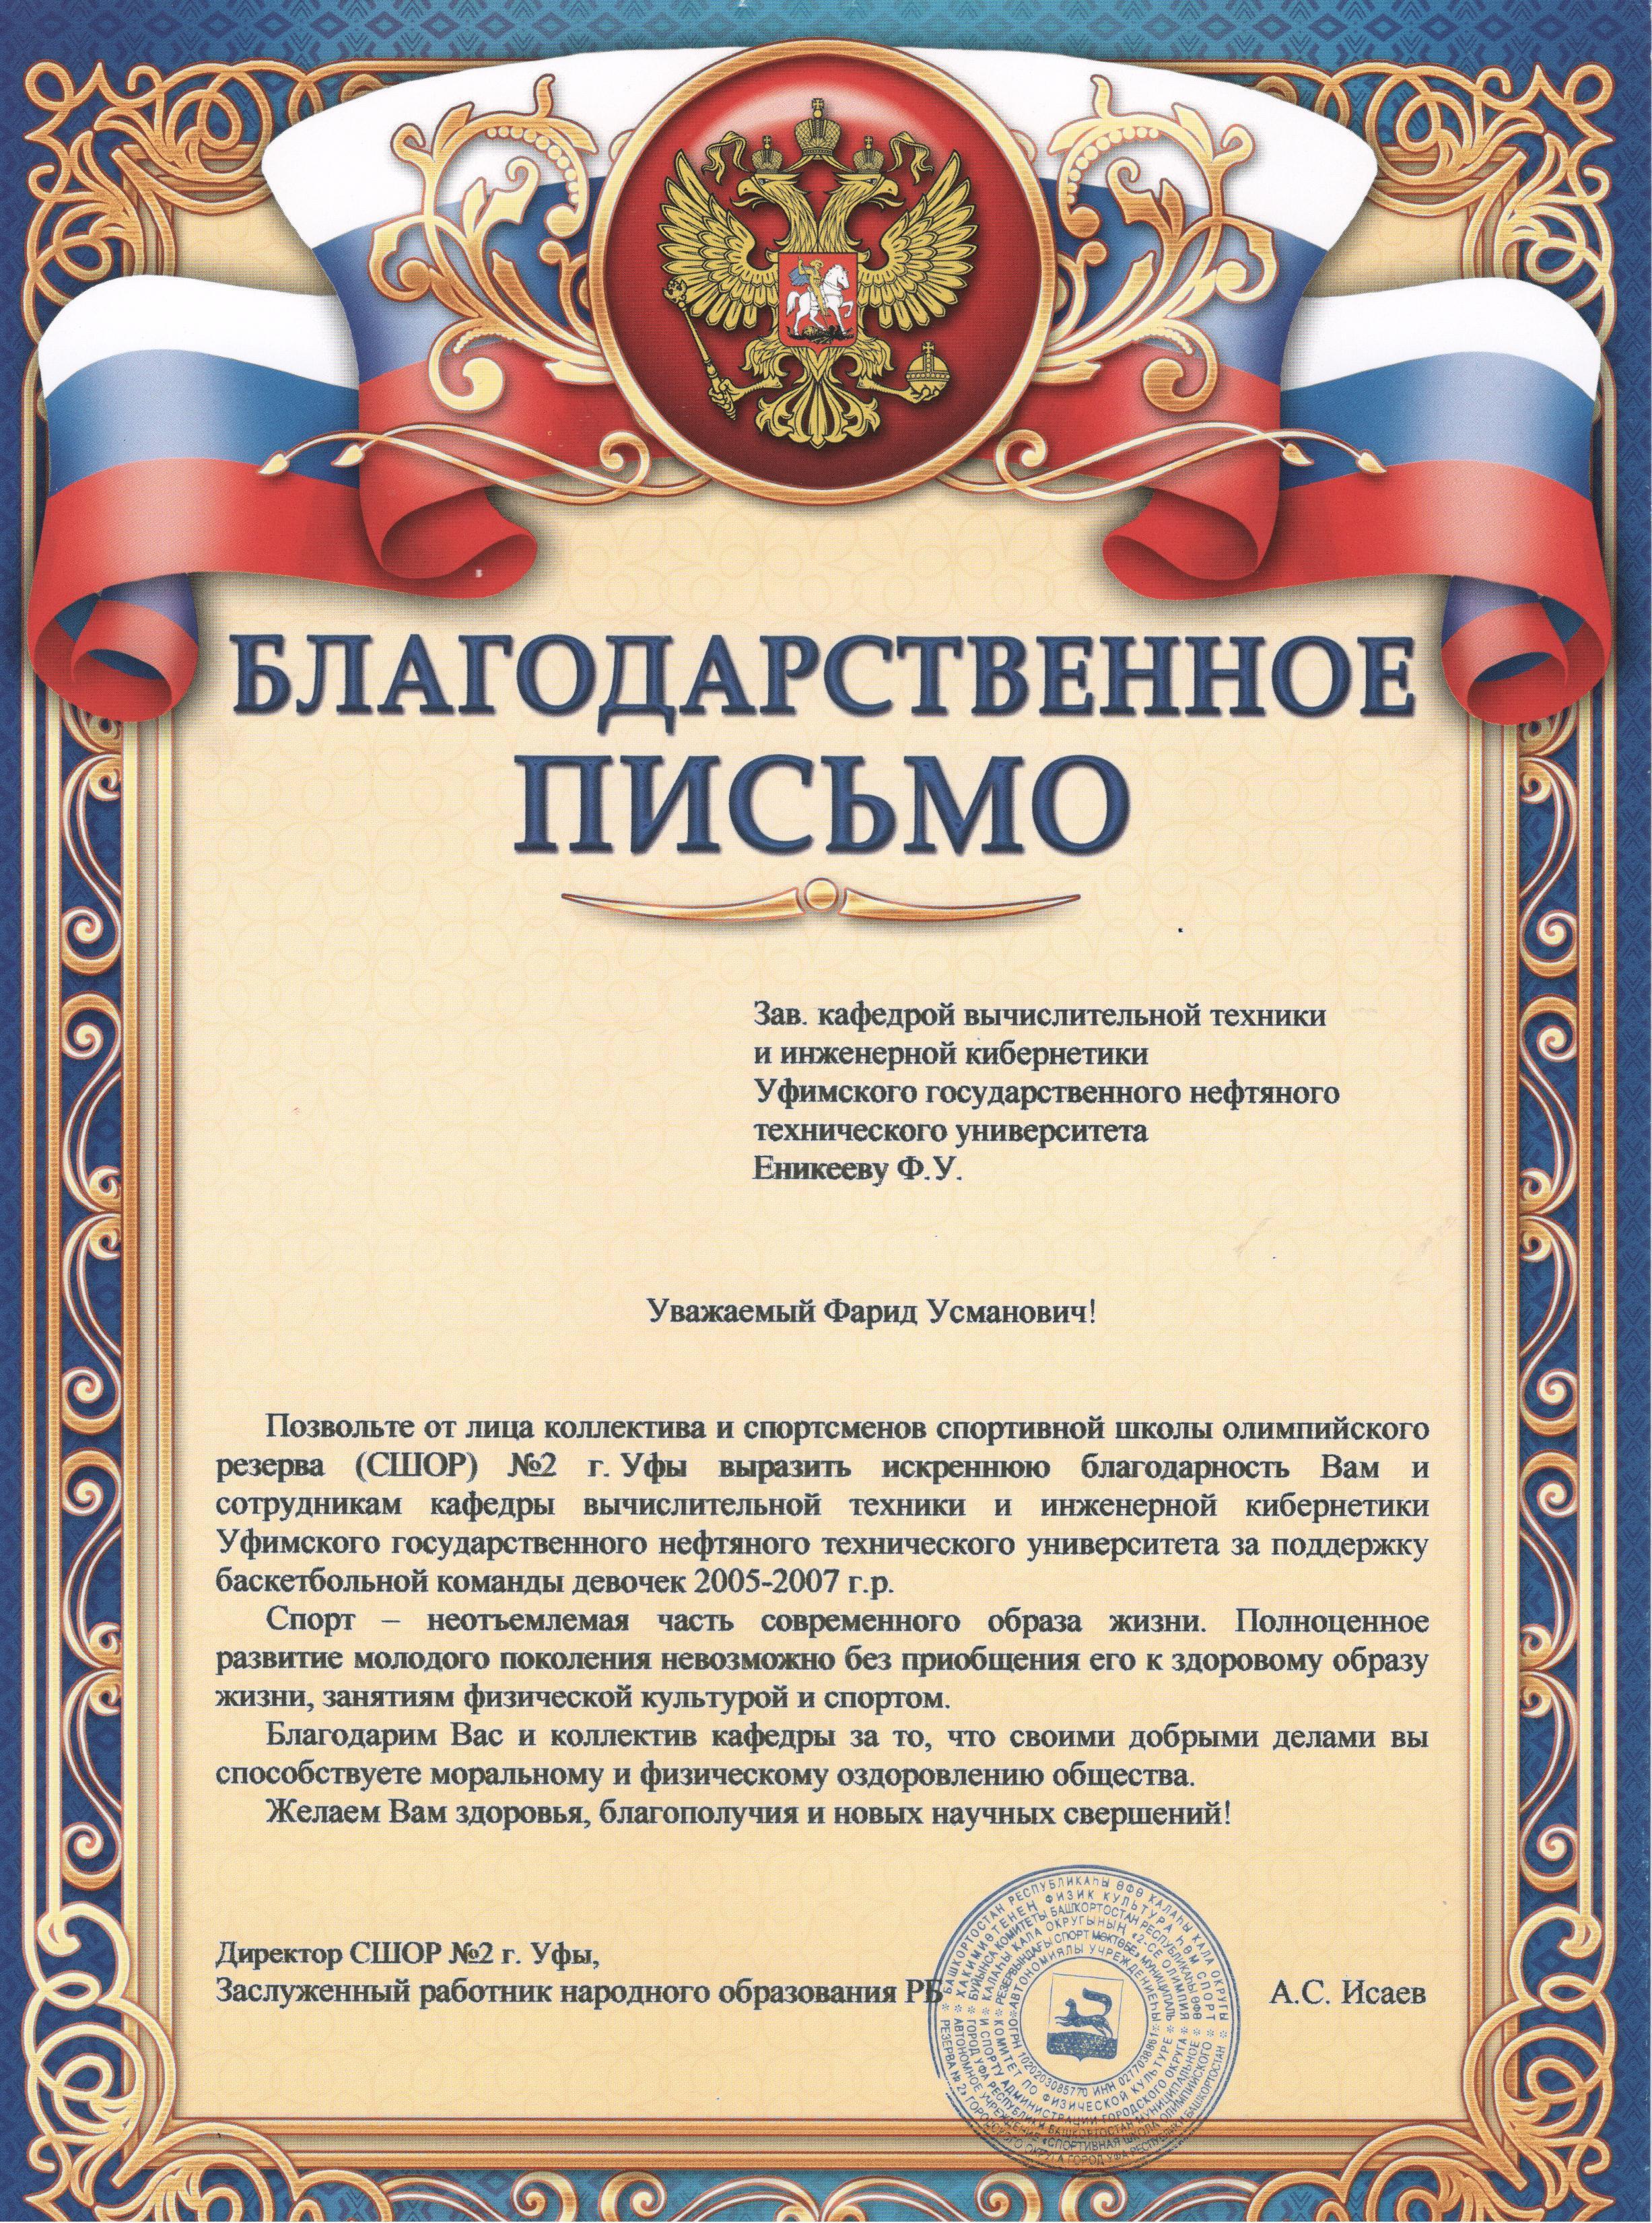 СШОР-2, #Кафедра_ВТИК, #ВТИК, #ФАПП, #УГНТУ, #Уфа, #Башкортостан